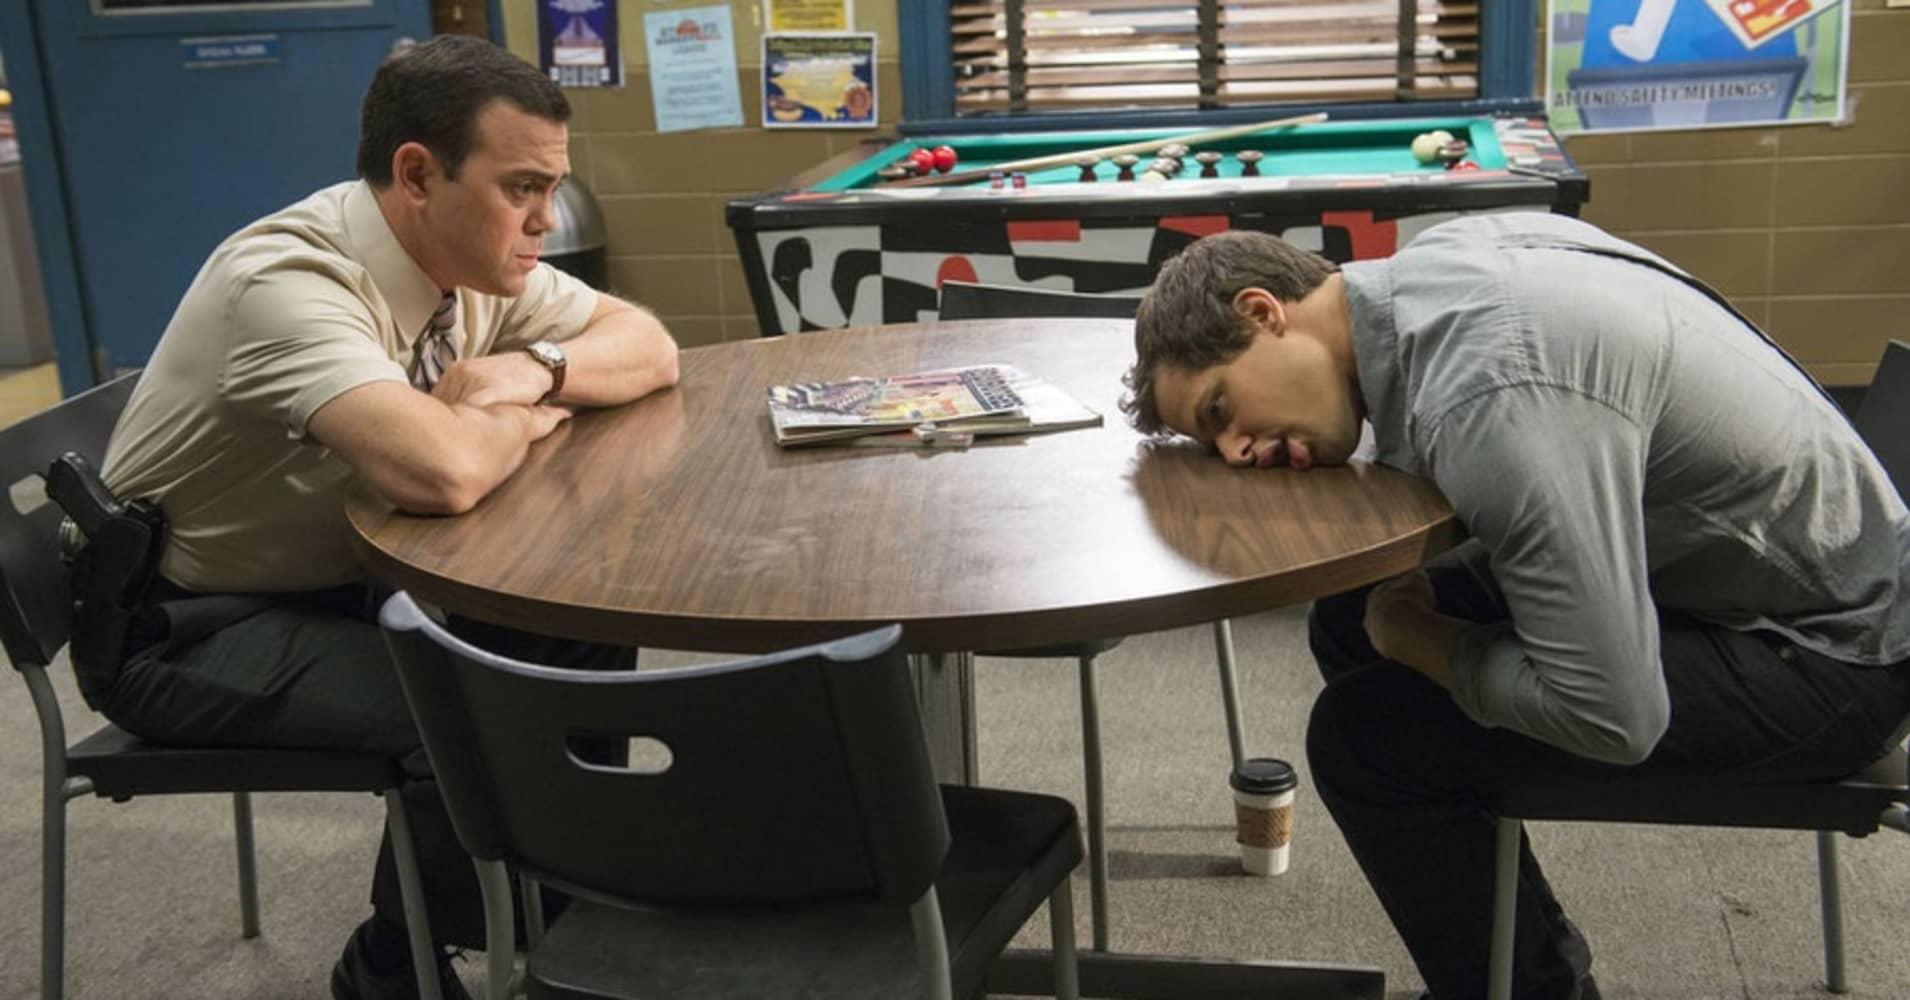 Jo Lo Truglio as Charles Boyle, Andy Samberg as Jake Peralta on NBC's 'Brooklyn Nine-Nine.'